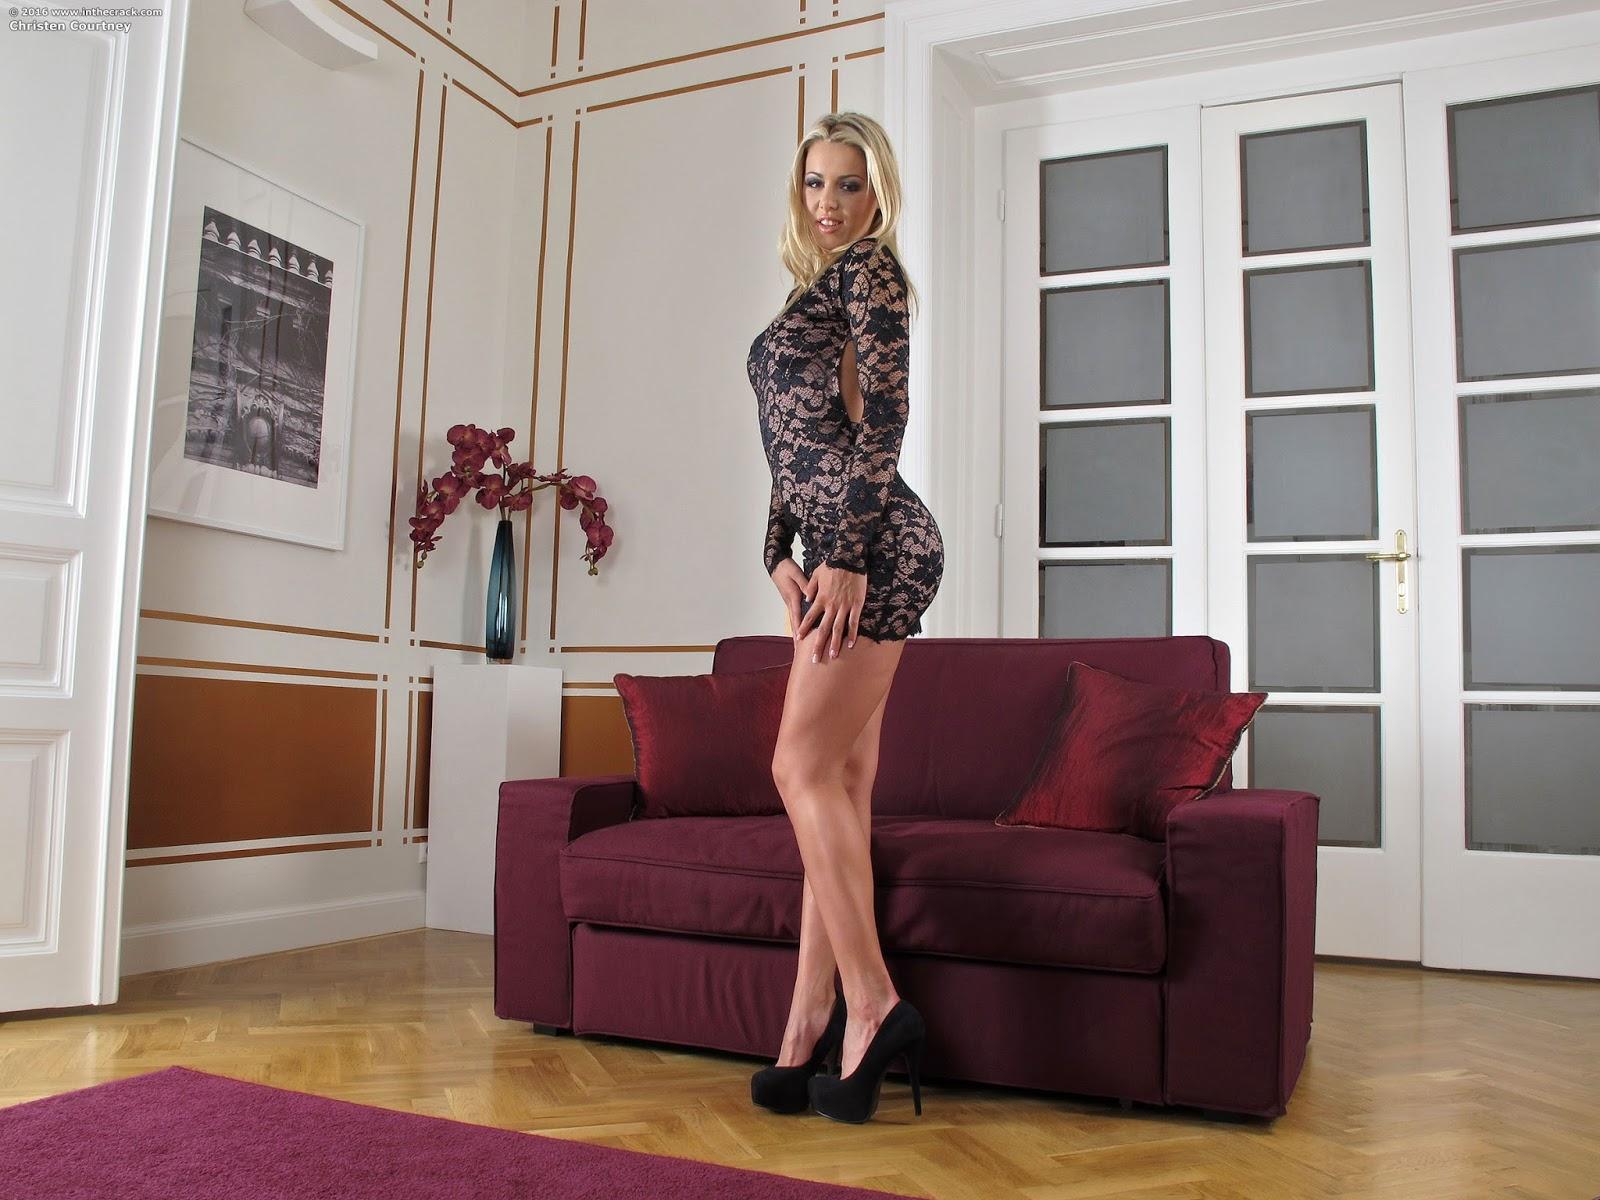 Hot blonde Christen Courtney inserting speculum into gaping anus  475173